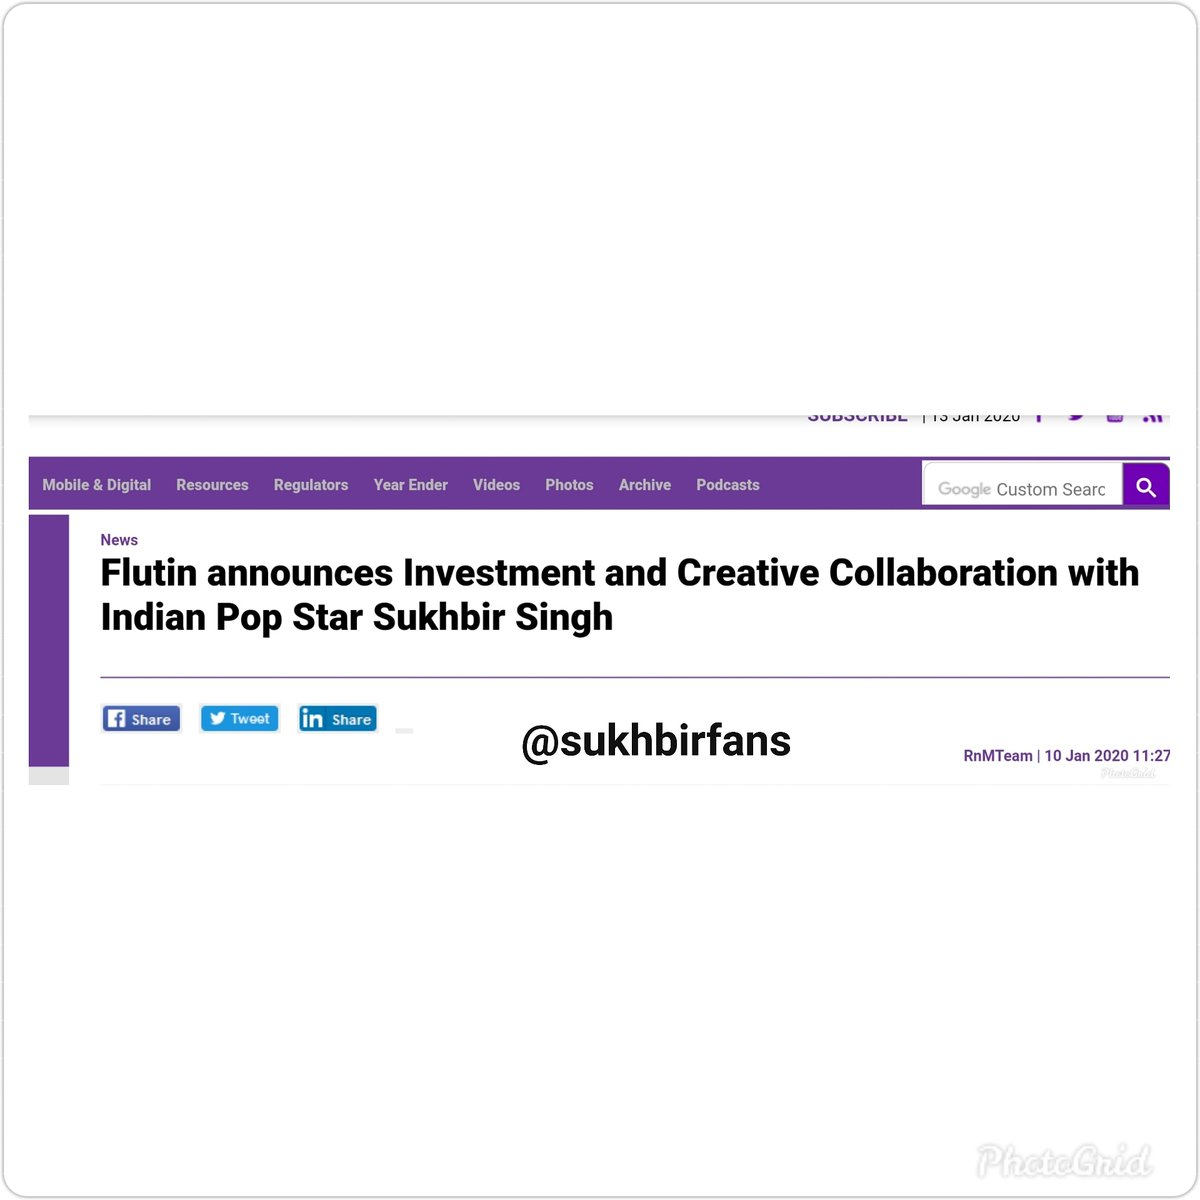 Another great news . . . #SukhbirSinger #sukhbir #sukhbir_singer #sukhbir_singh #sukhbirfans #Sukhbir #sukhbirsingh #ohhohoho #ishqteratadpaave #ishqteratadpave #SaudaKharaKhara #dillagana #galbangayi #trending #viral @FlutinApppic.twitter.com/7g03HFqs4G